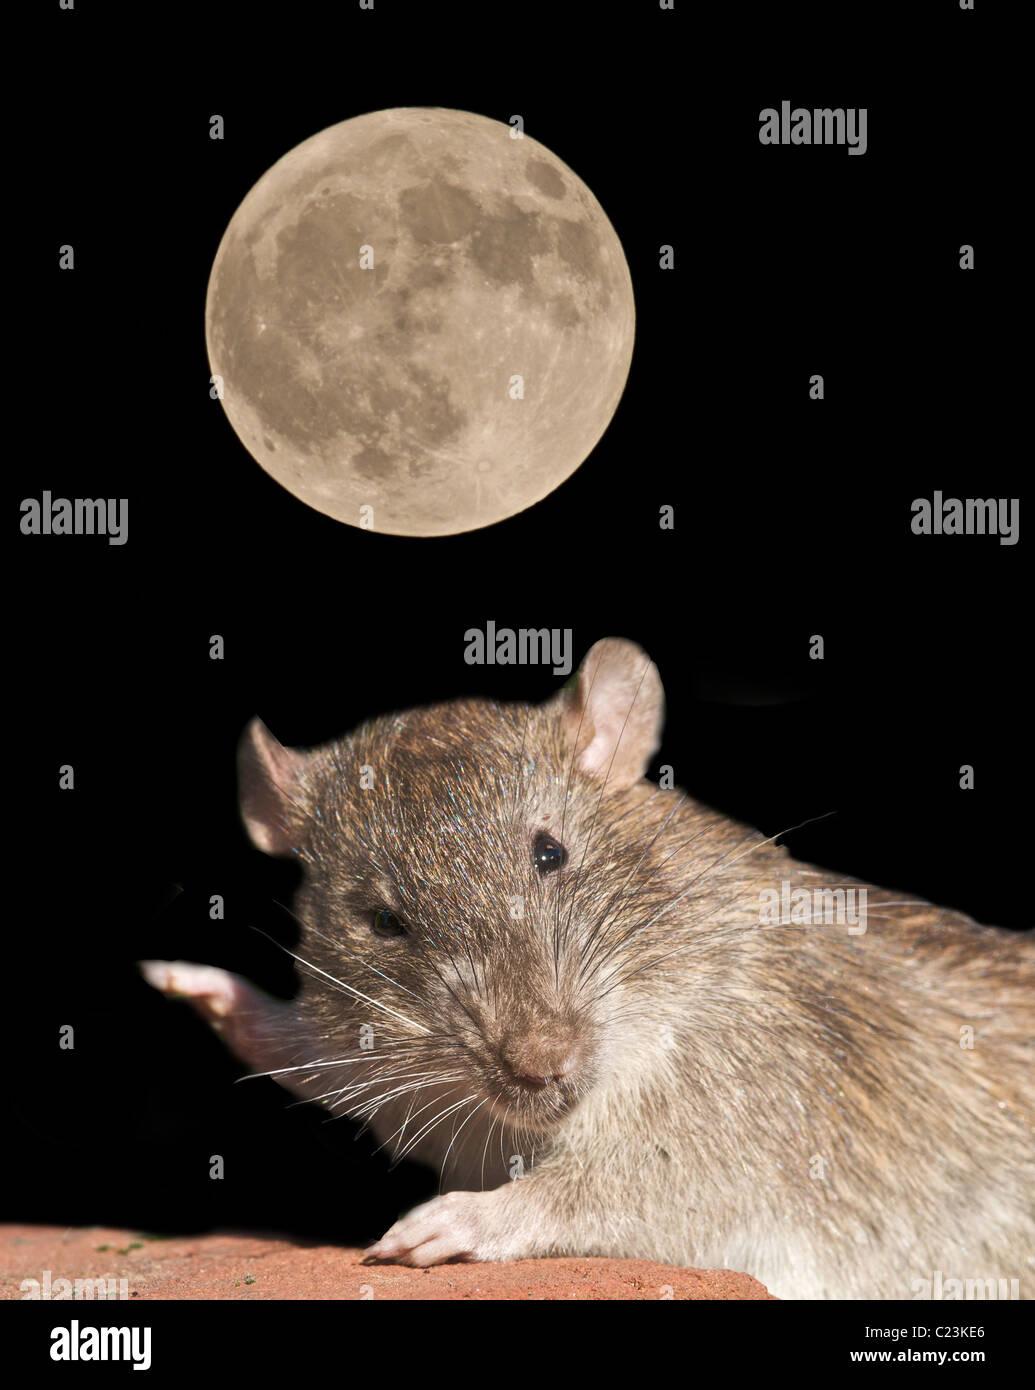 Common or brown rat (Rattus norvegicus) Digitally enhanced image by moonlight. UK - Stock Image